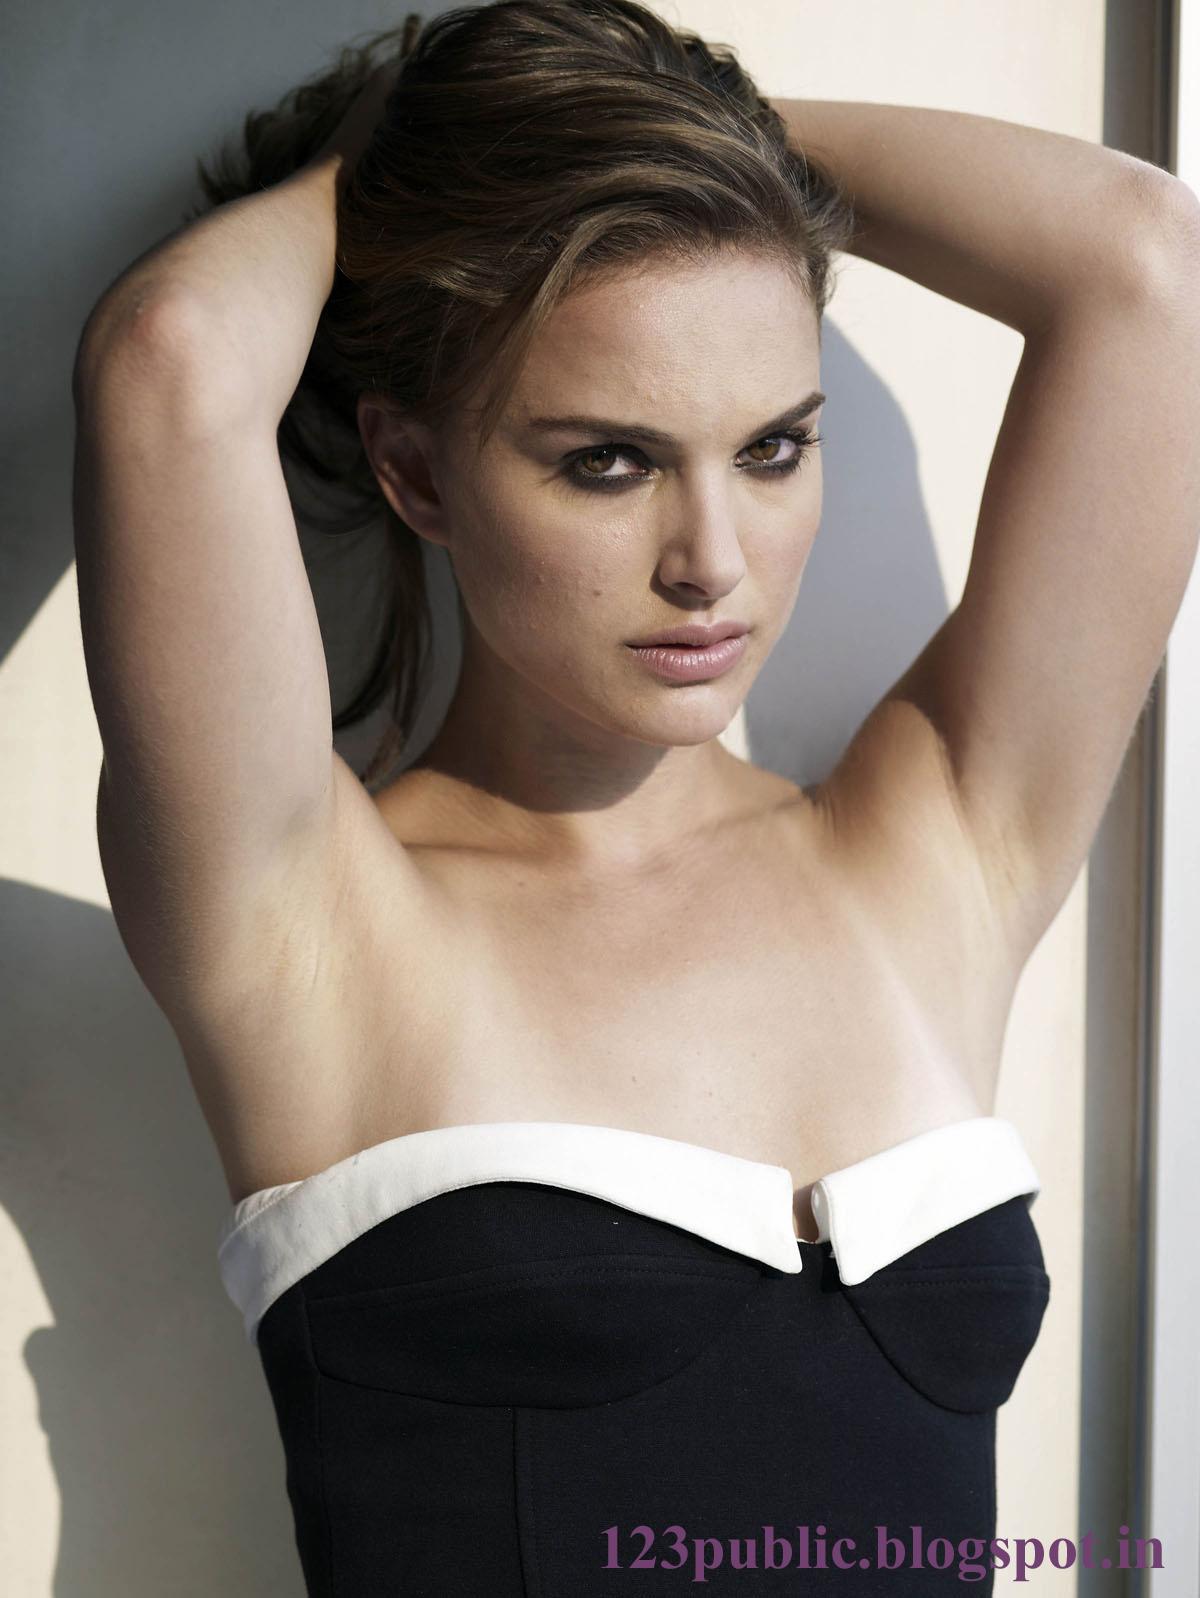 123public: USA actress Natalie Portman Hot Phtoshoot Natalie Portman